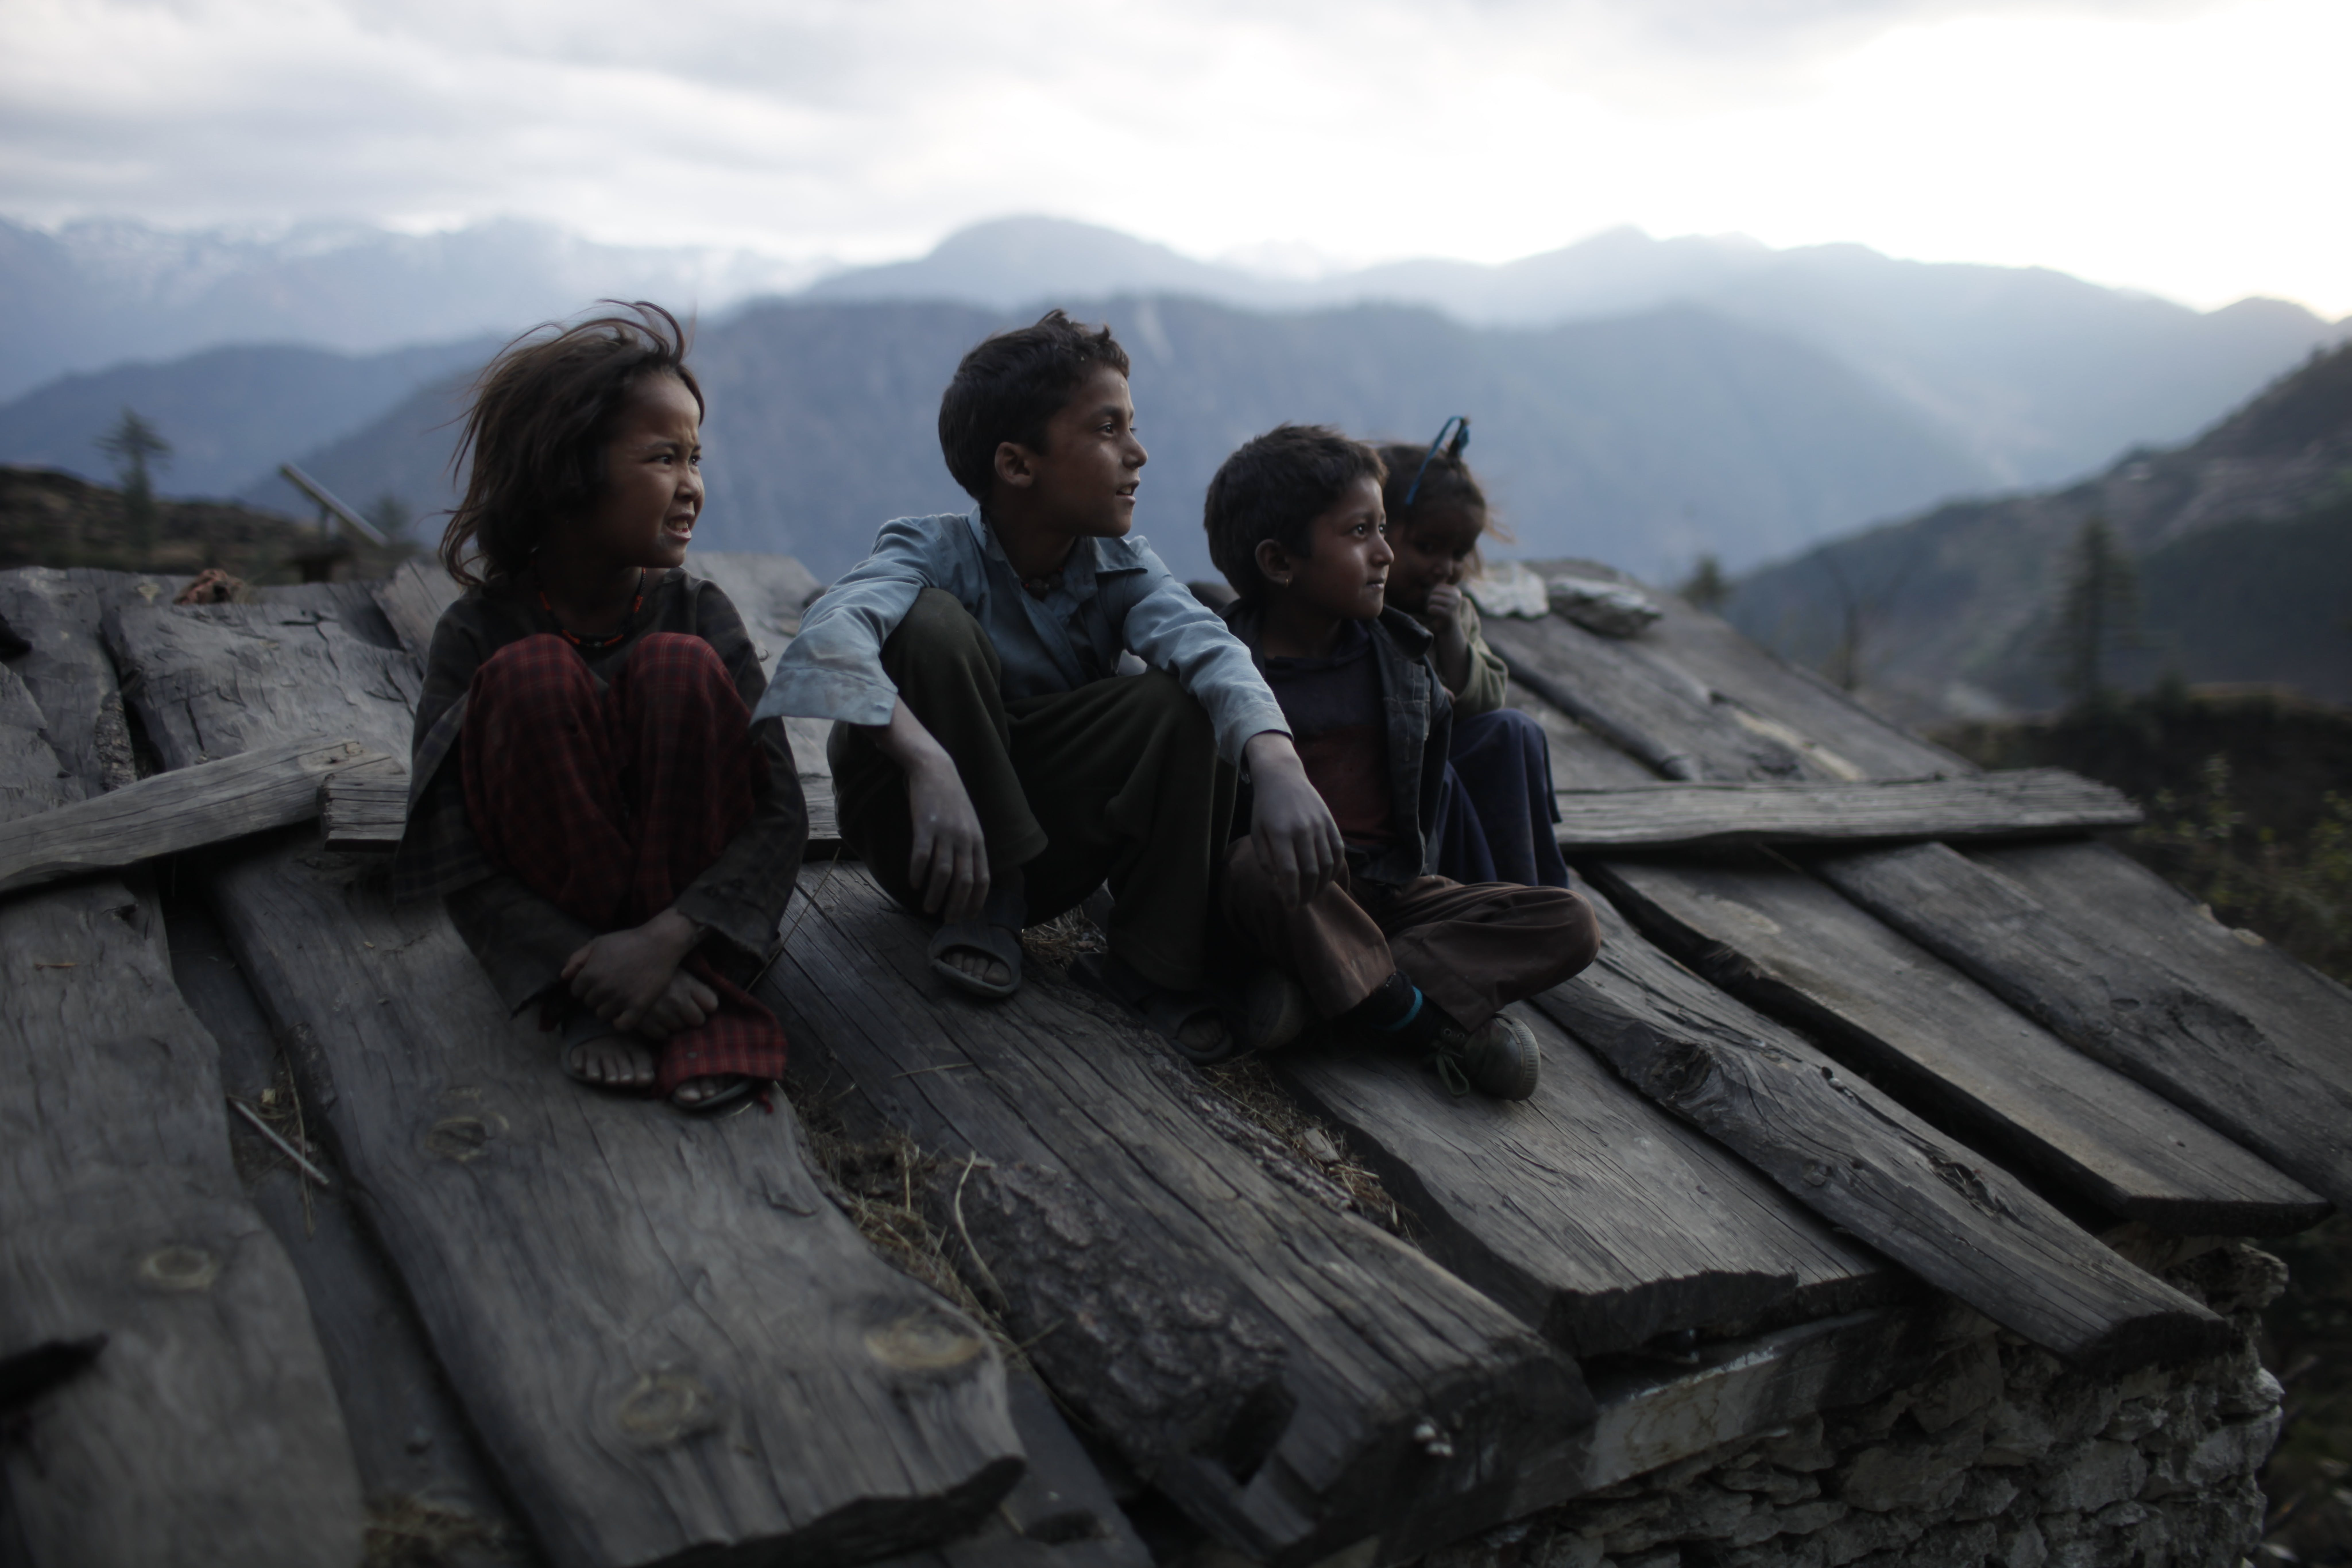 © UNICEF/NYHQ2009-0870/SOKOL